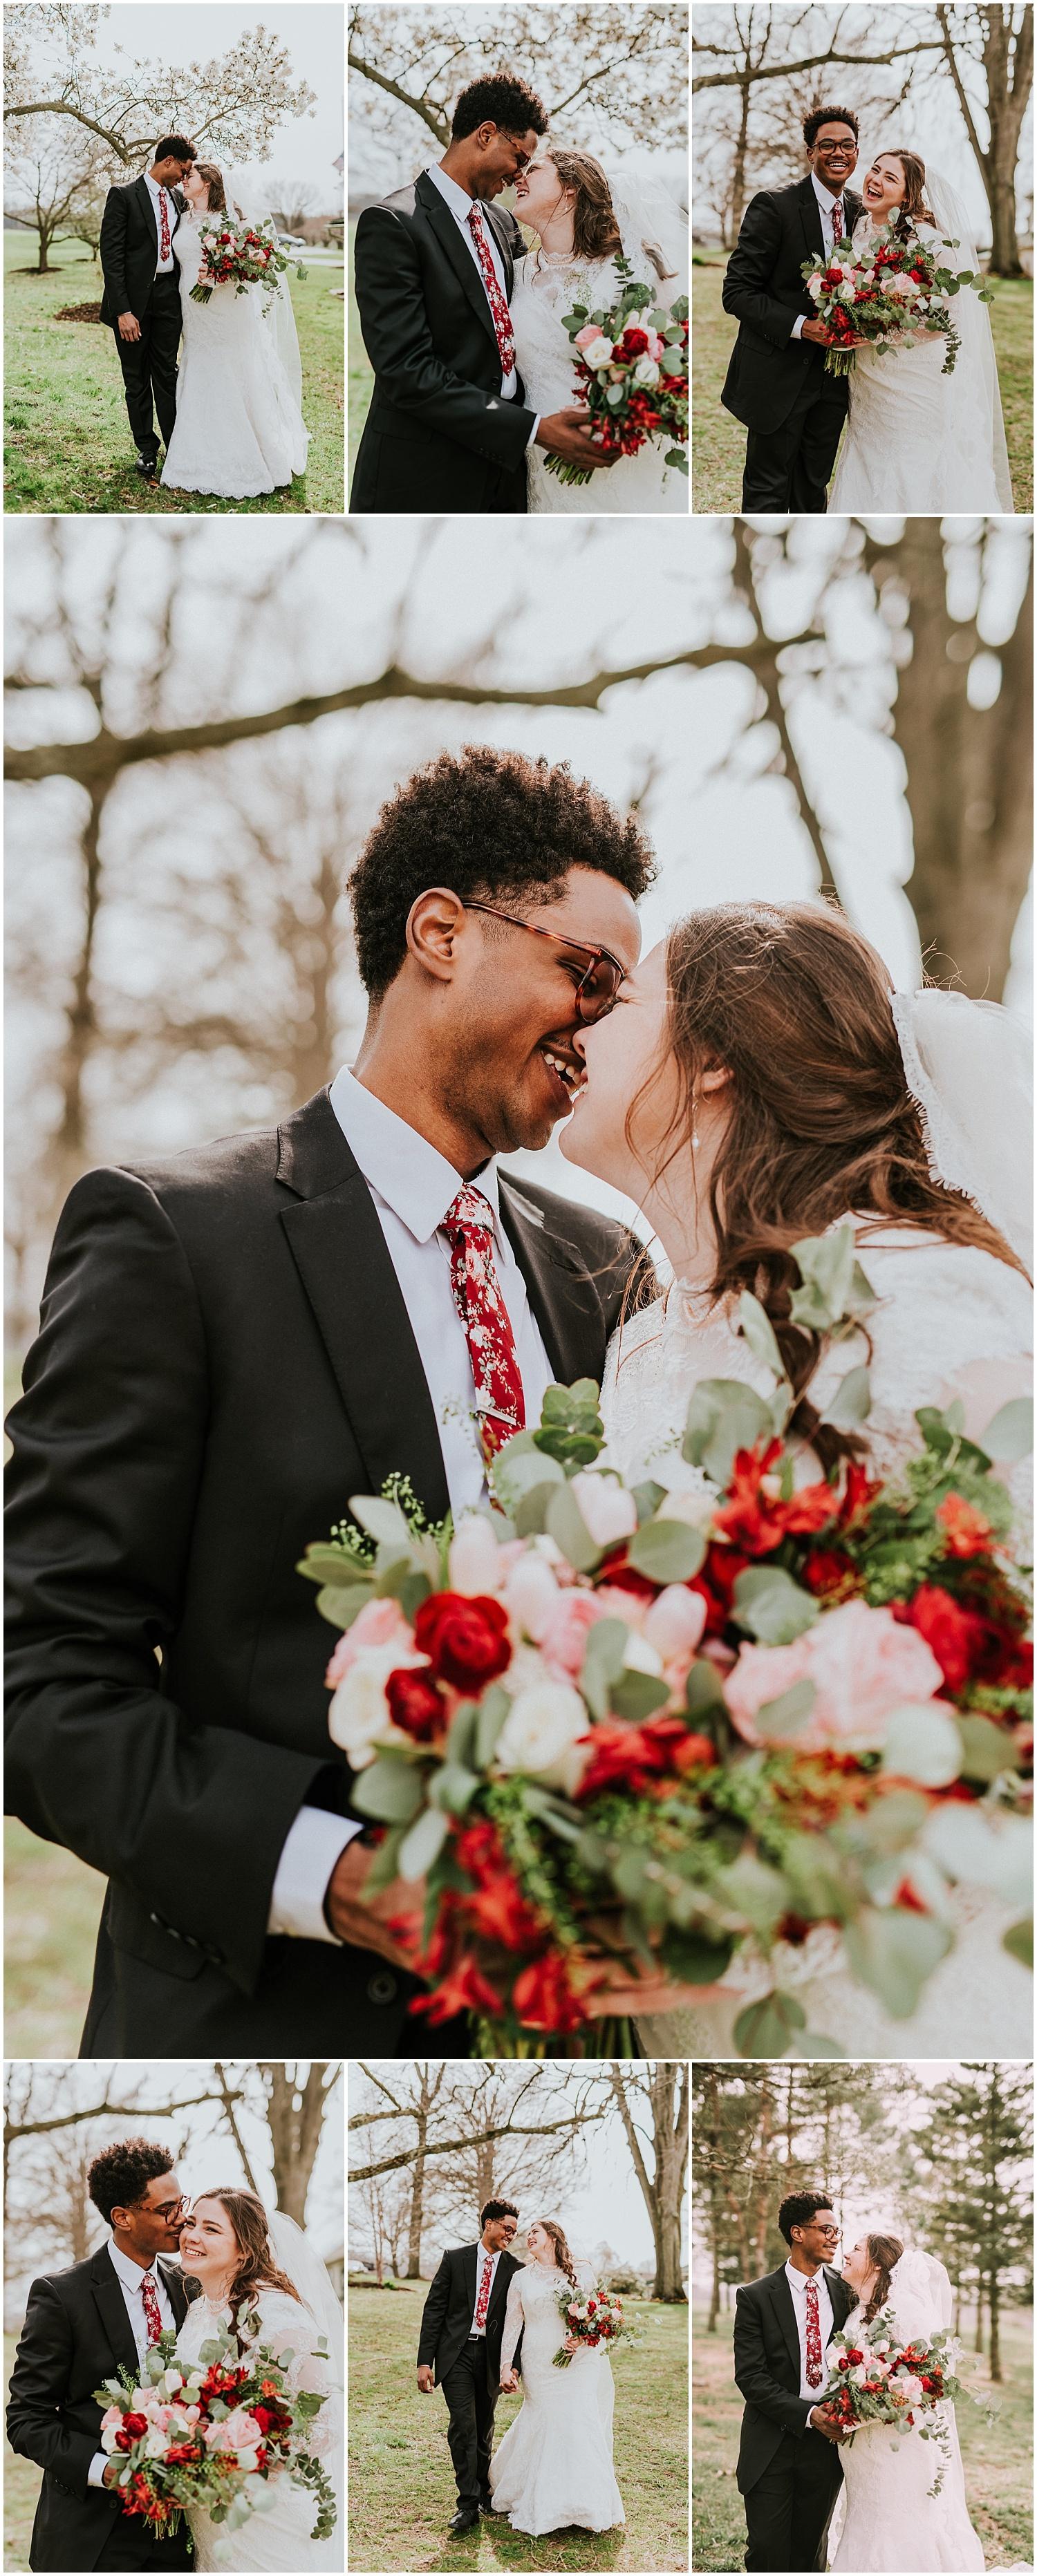 ariannabellephotography-philadelphia LDS wedding (8).jpg